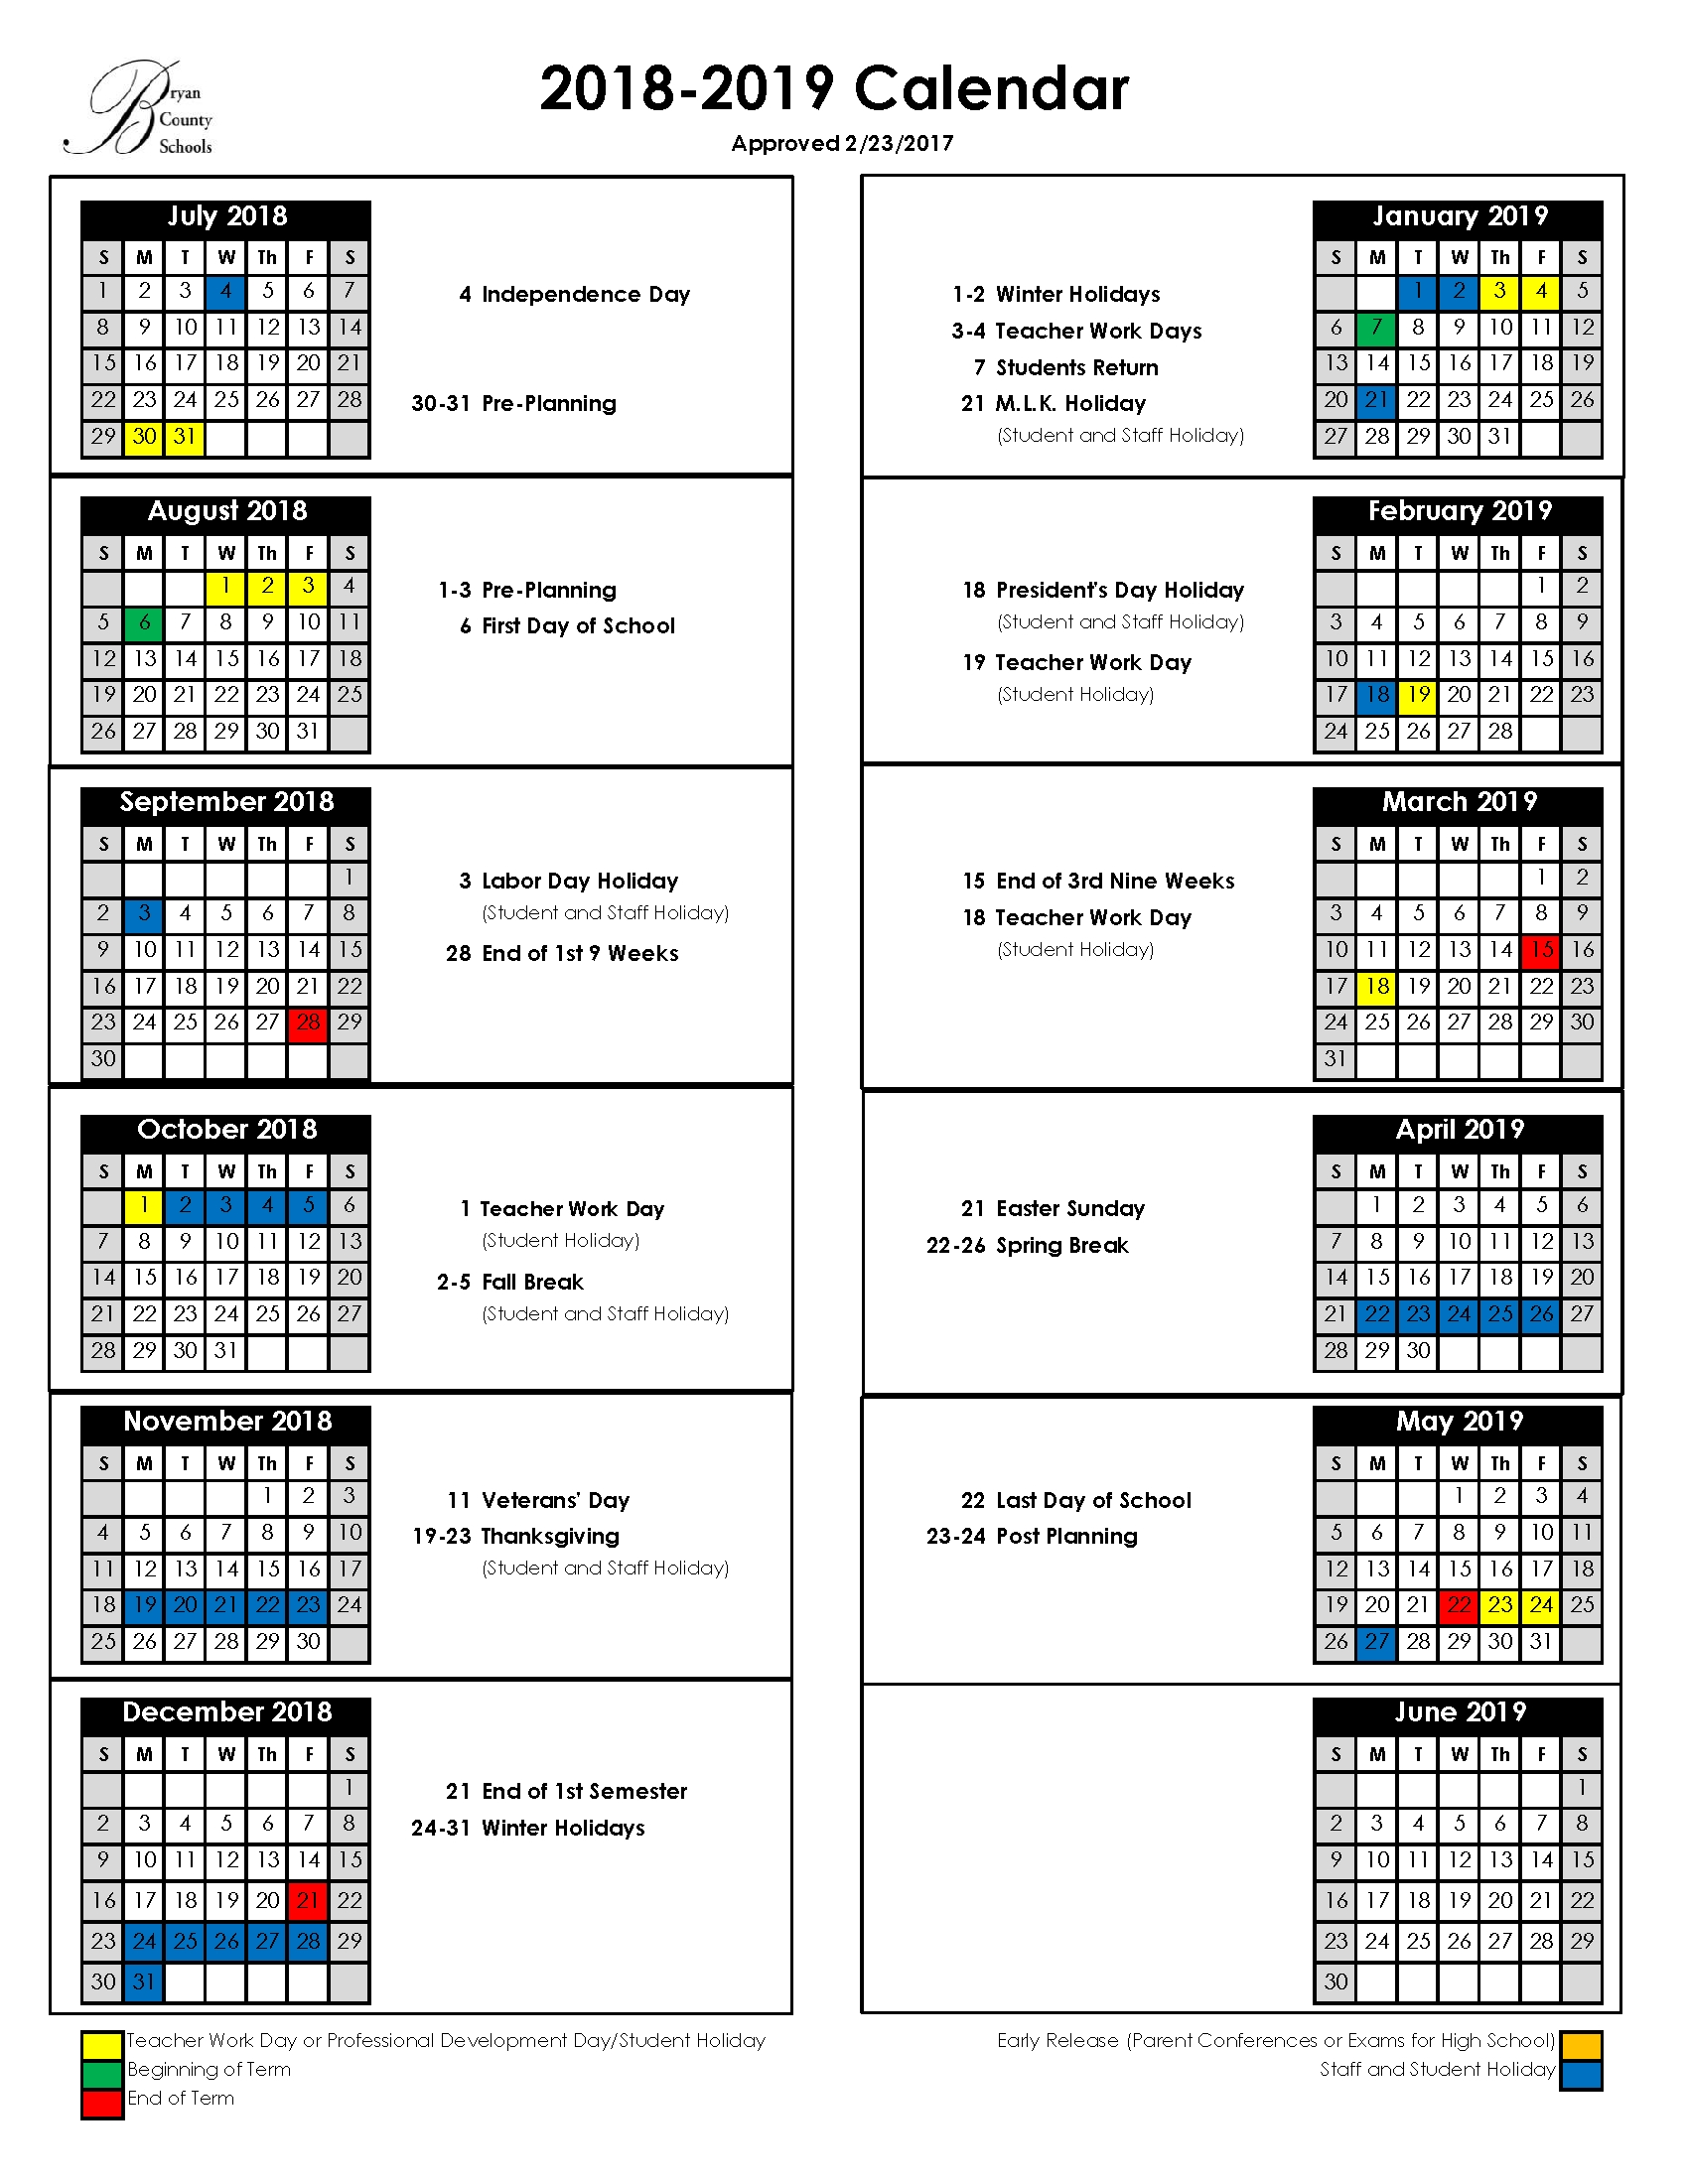 Bryan County Schools School Calendar District 2